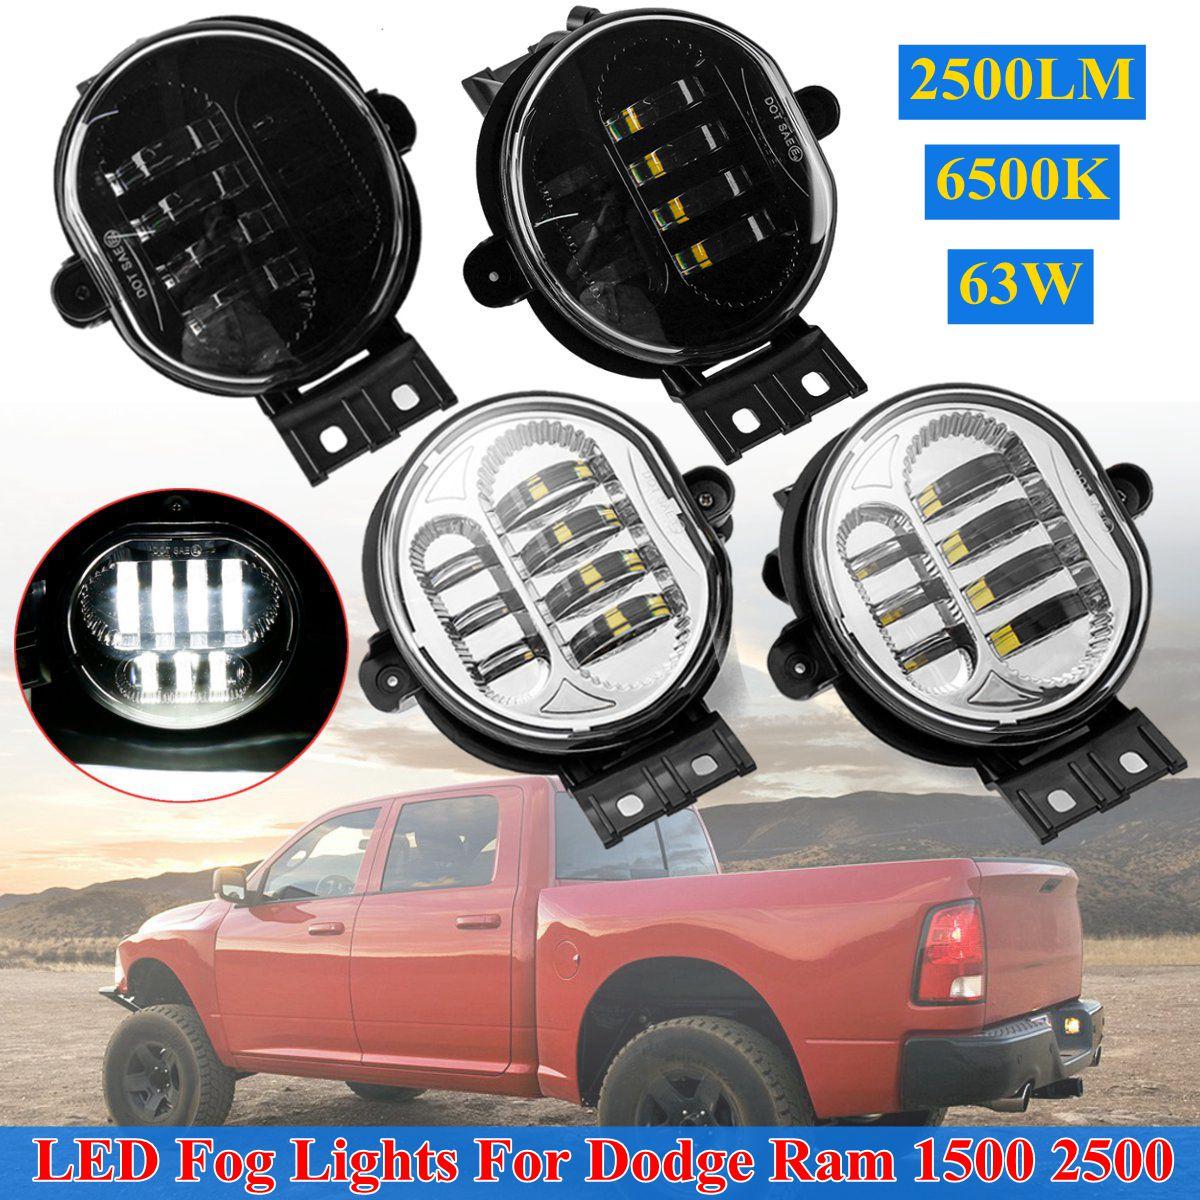 2 Colors Front LED Car Front Bumper Fog Light Lamp Car Styling For Dodge Ram 1500 2002-2008 2500/3500 2003-2009 Durango car front